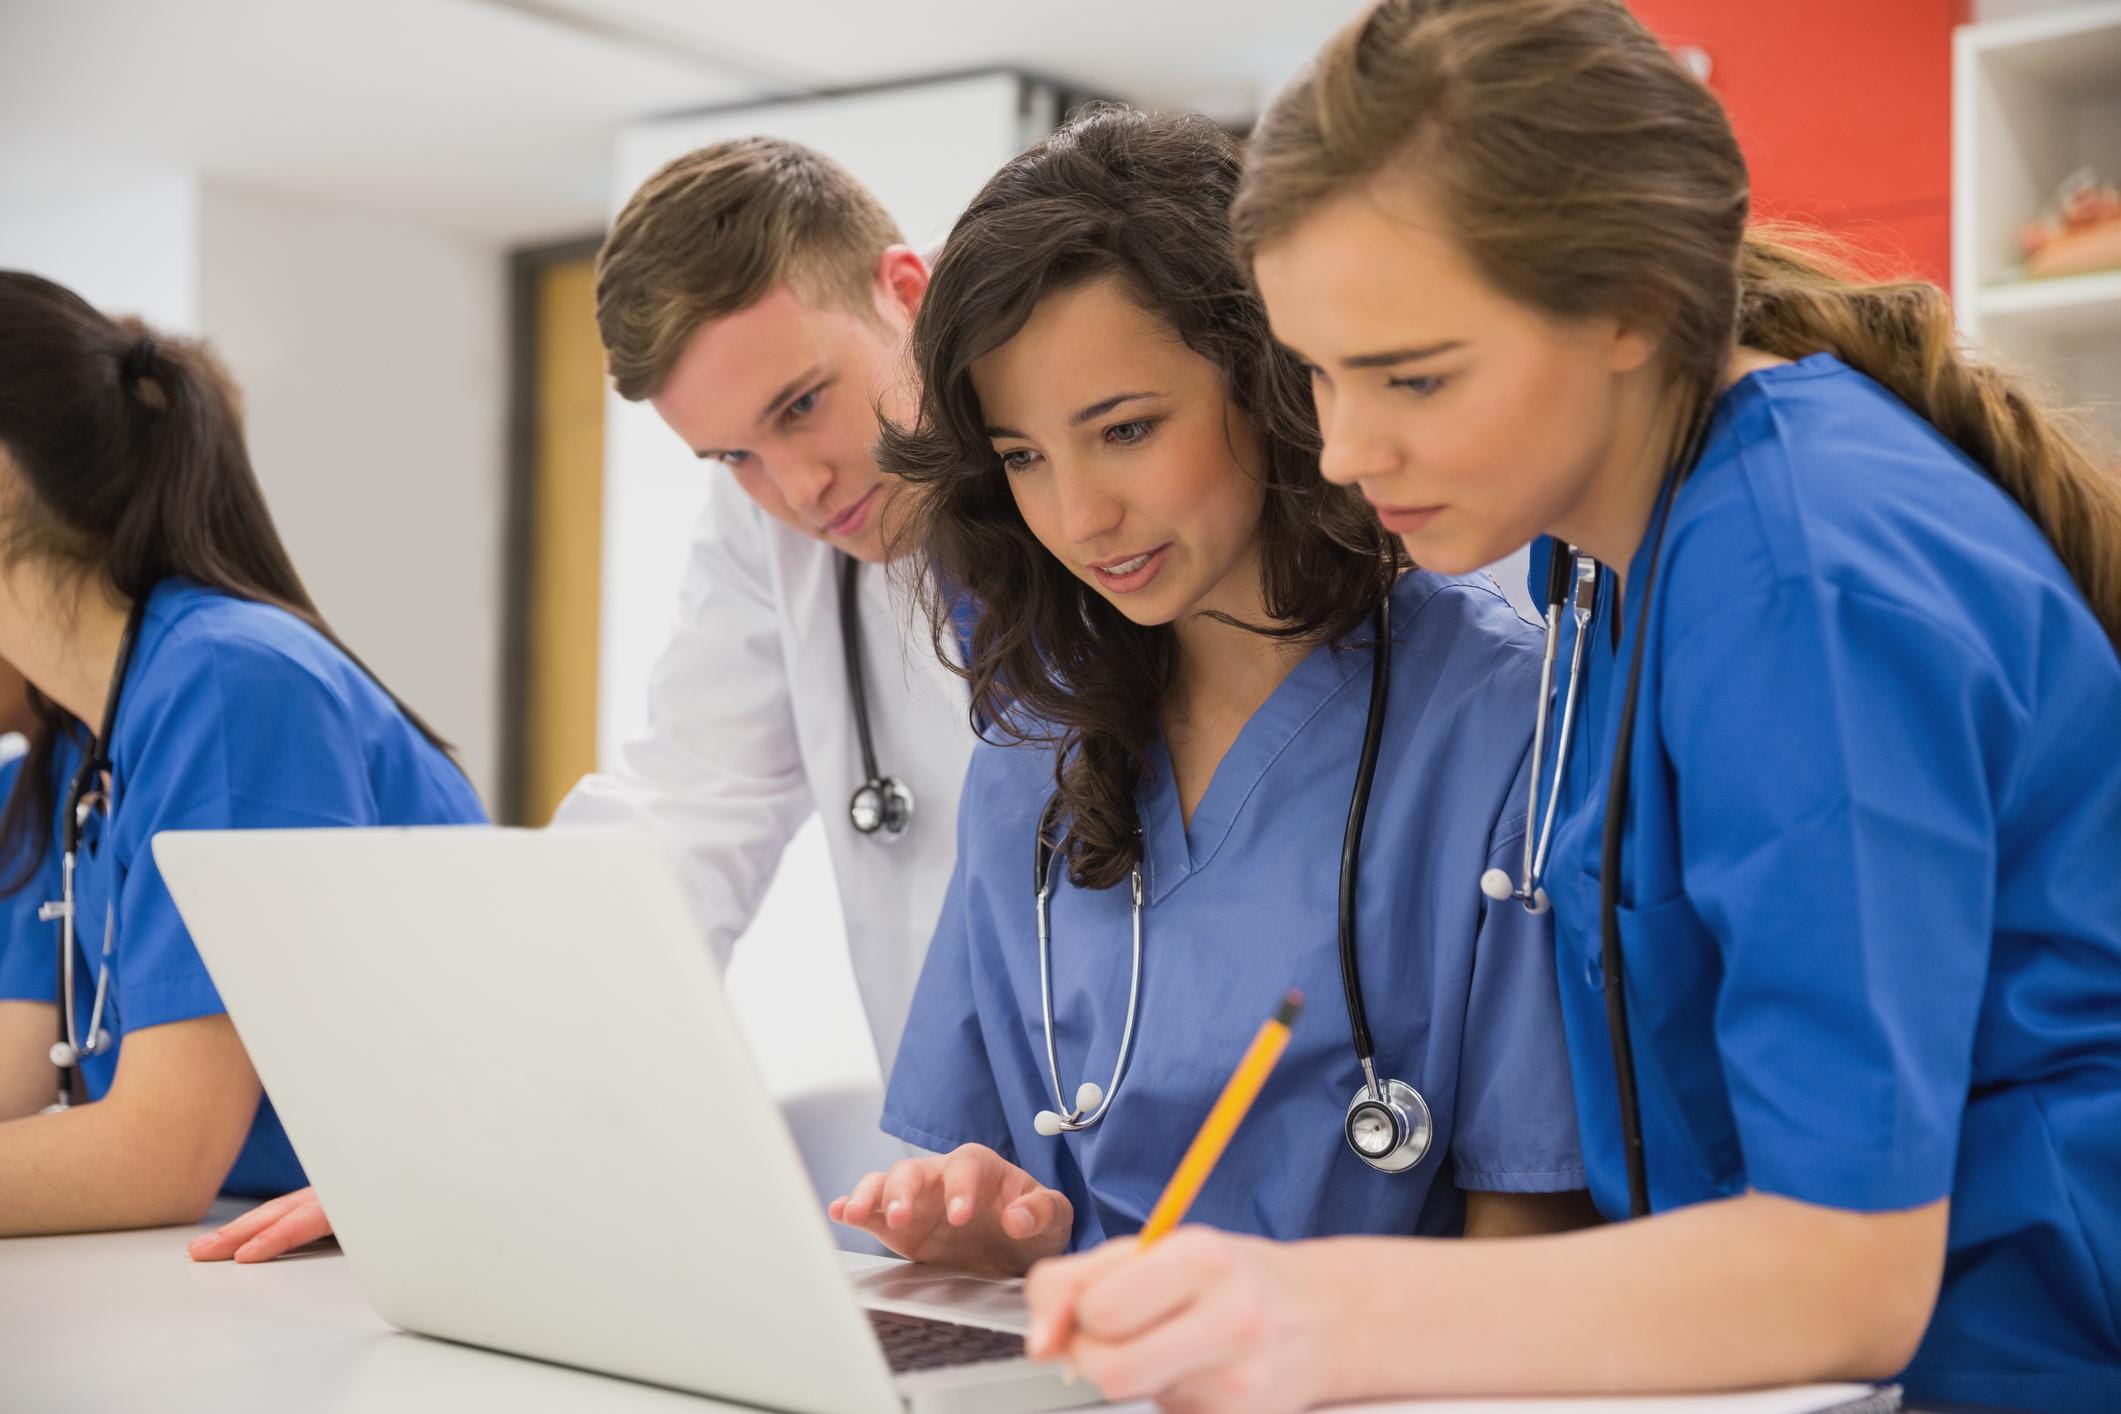 Three medical students looking at a laptop